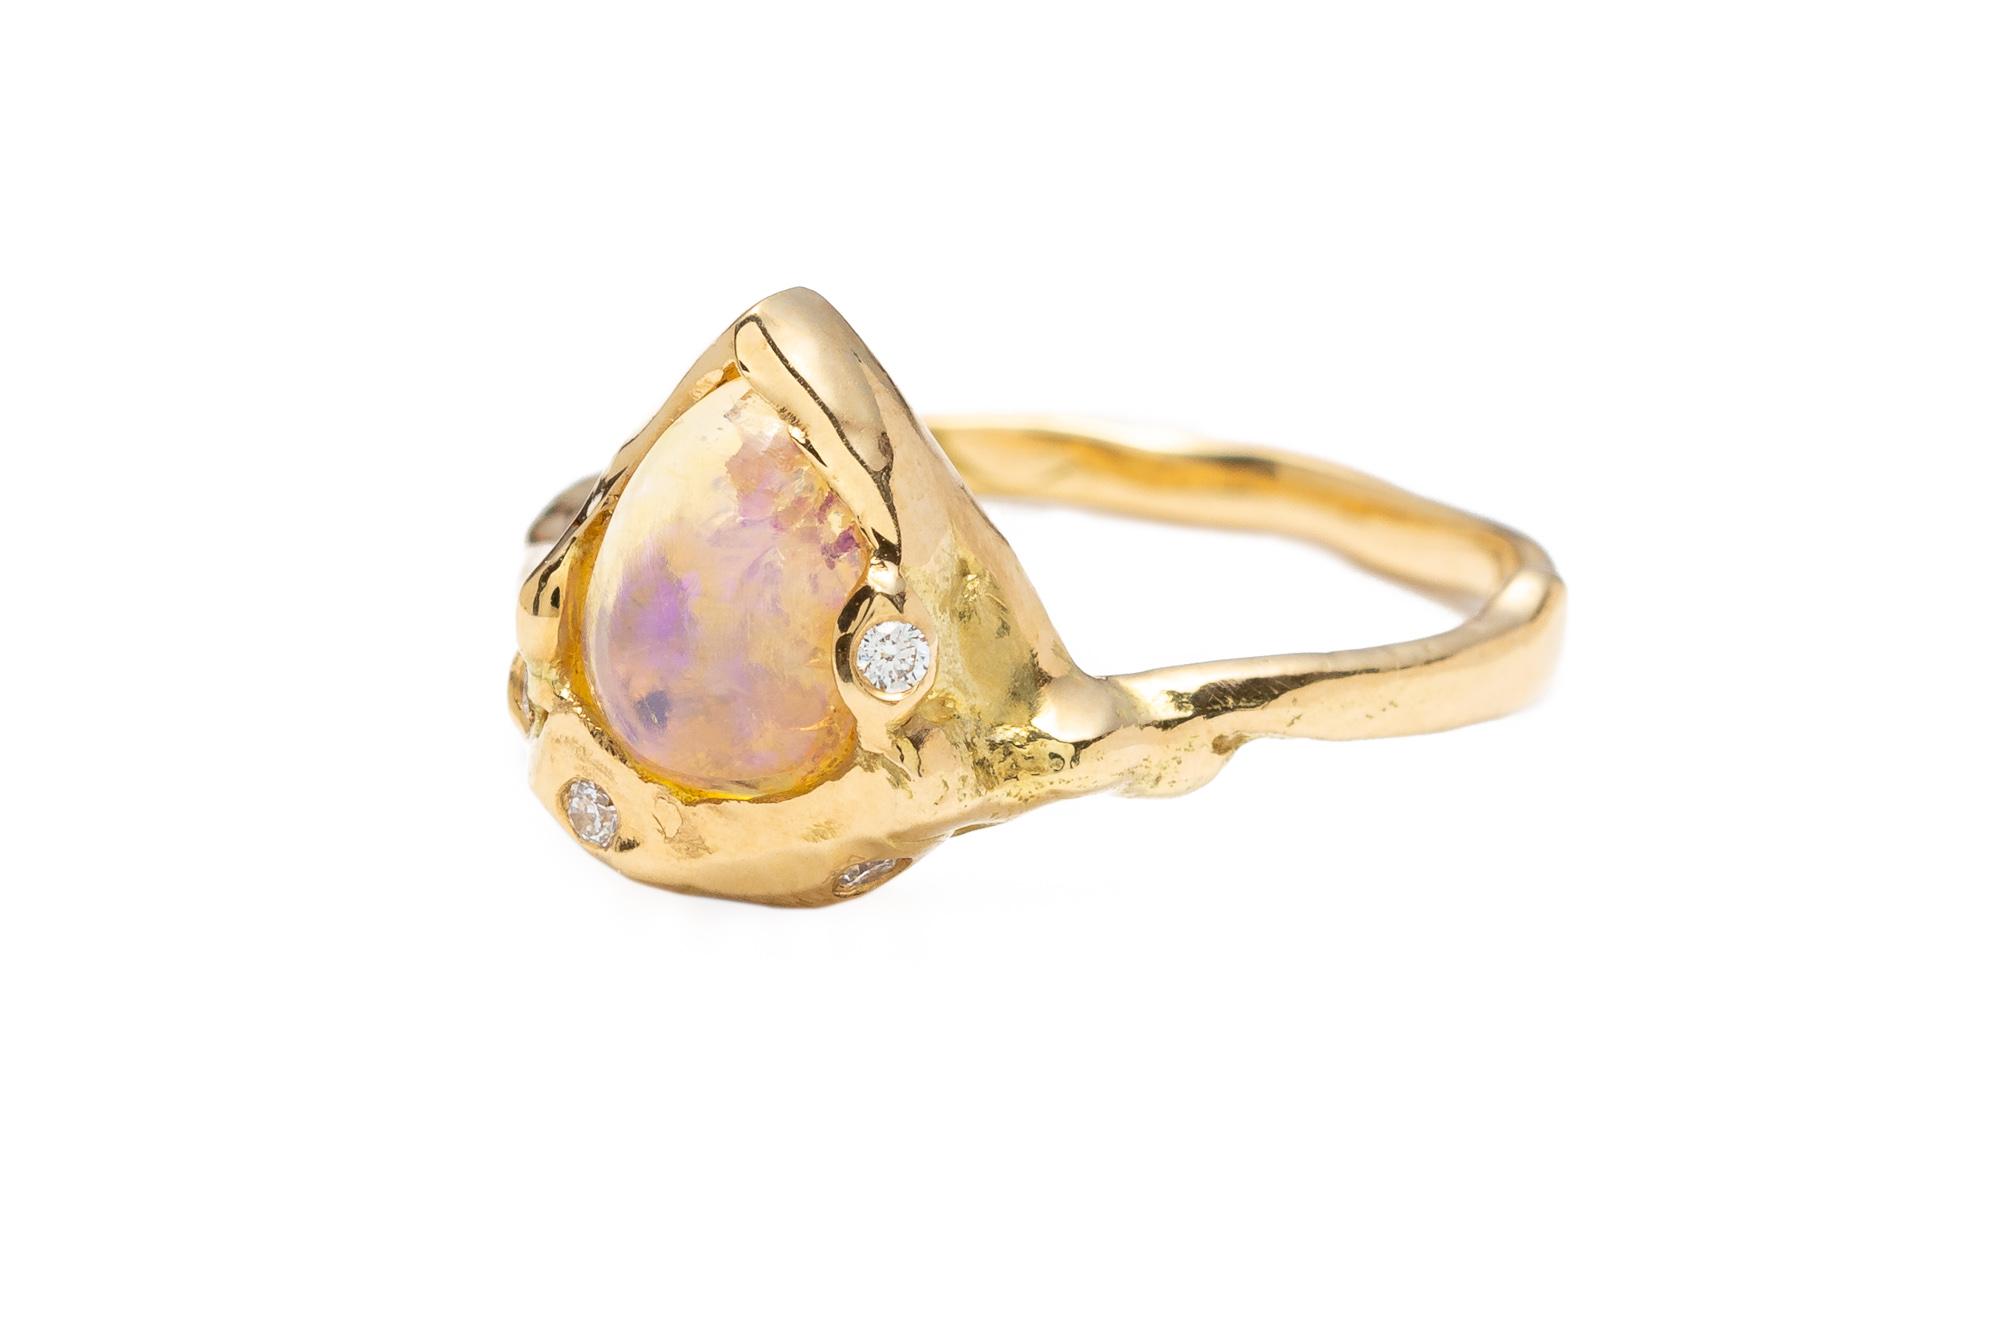 2019-08-05 Jewelry00541-Edit.jpg